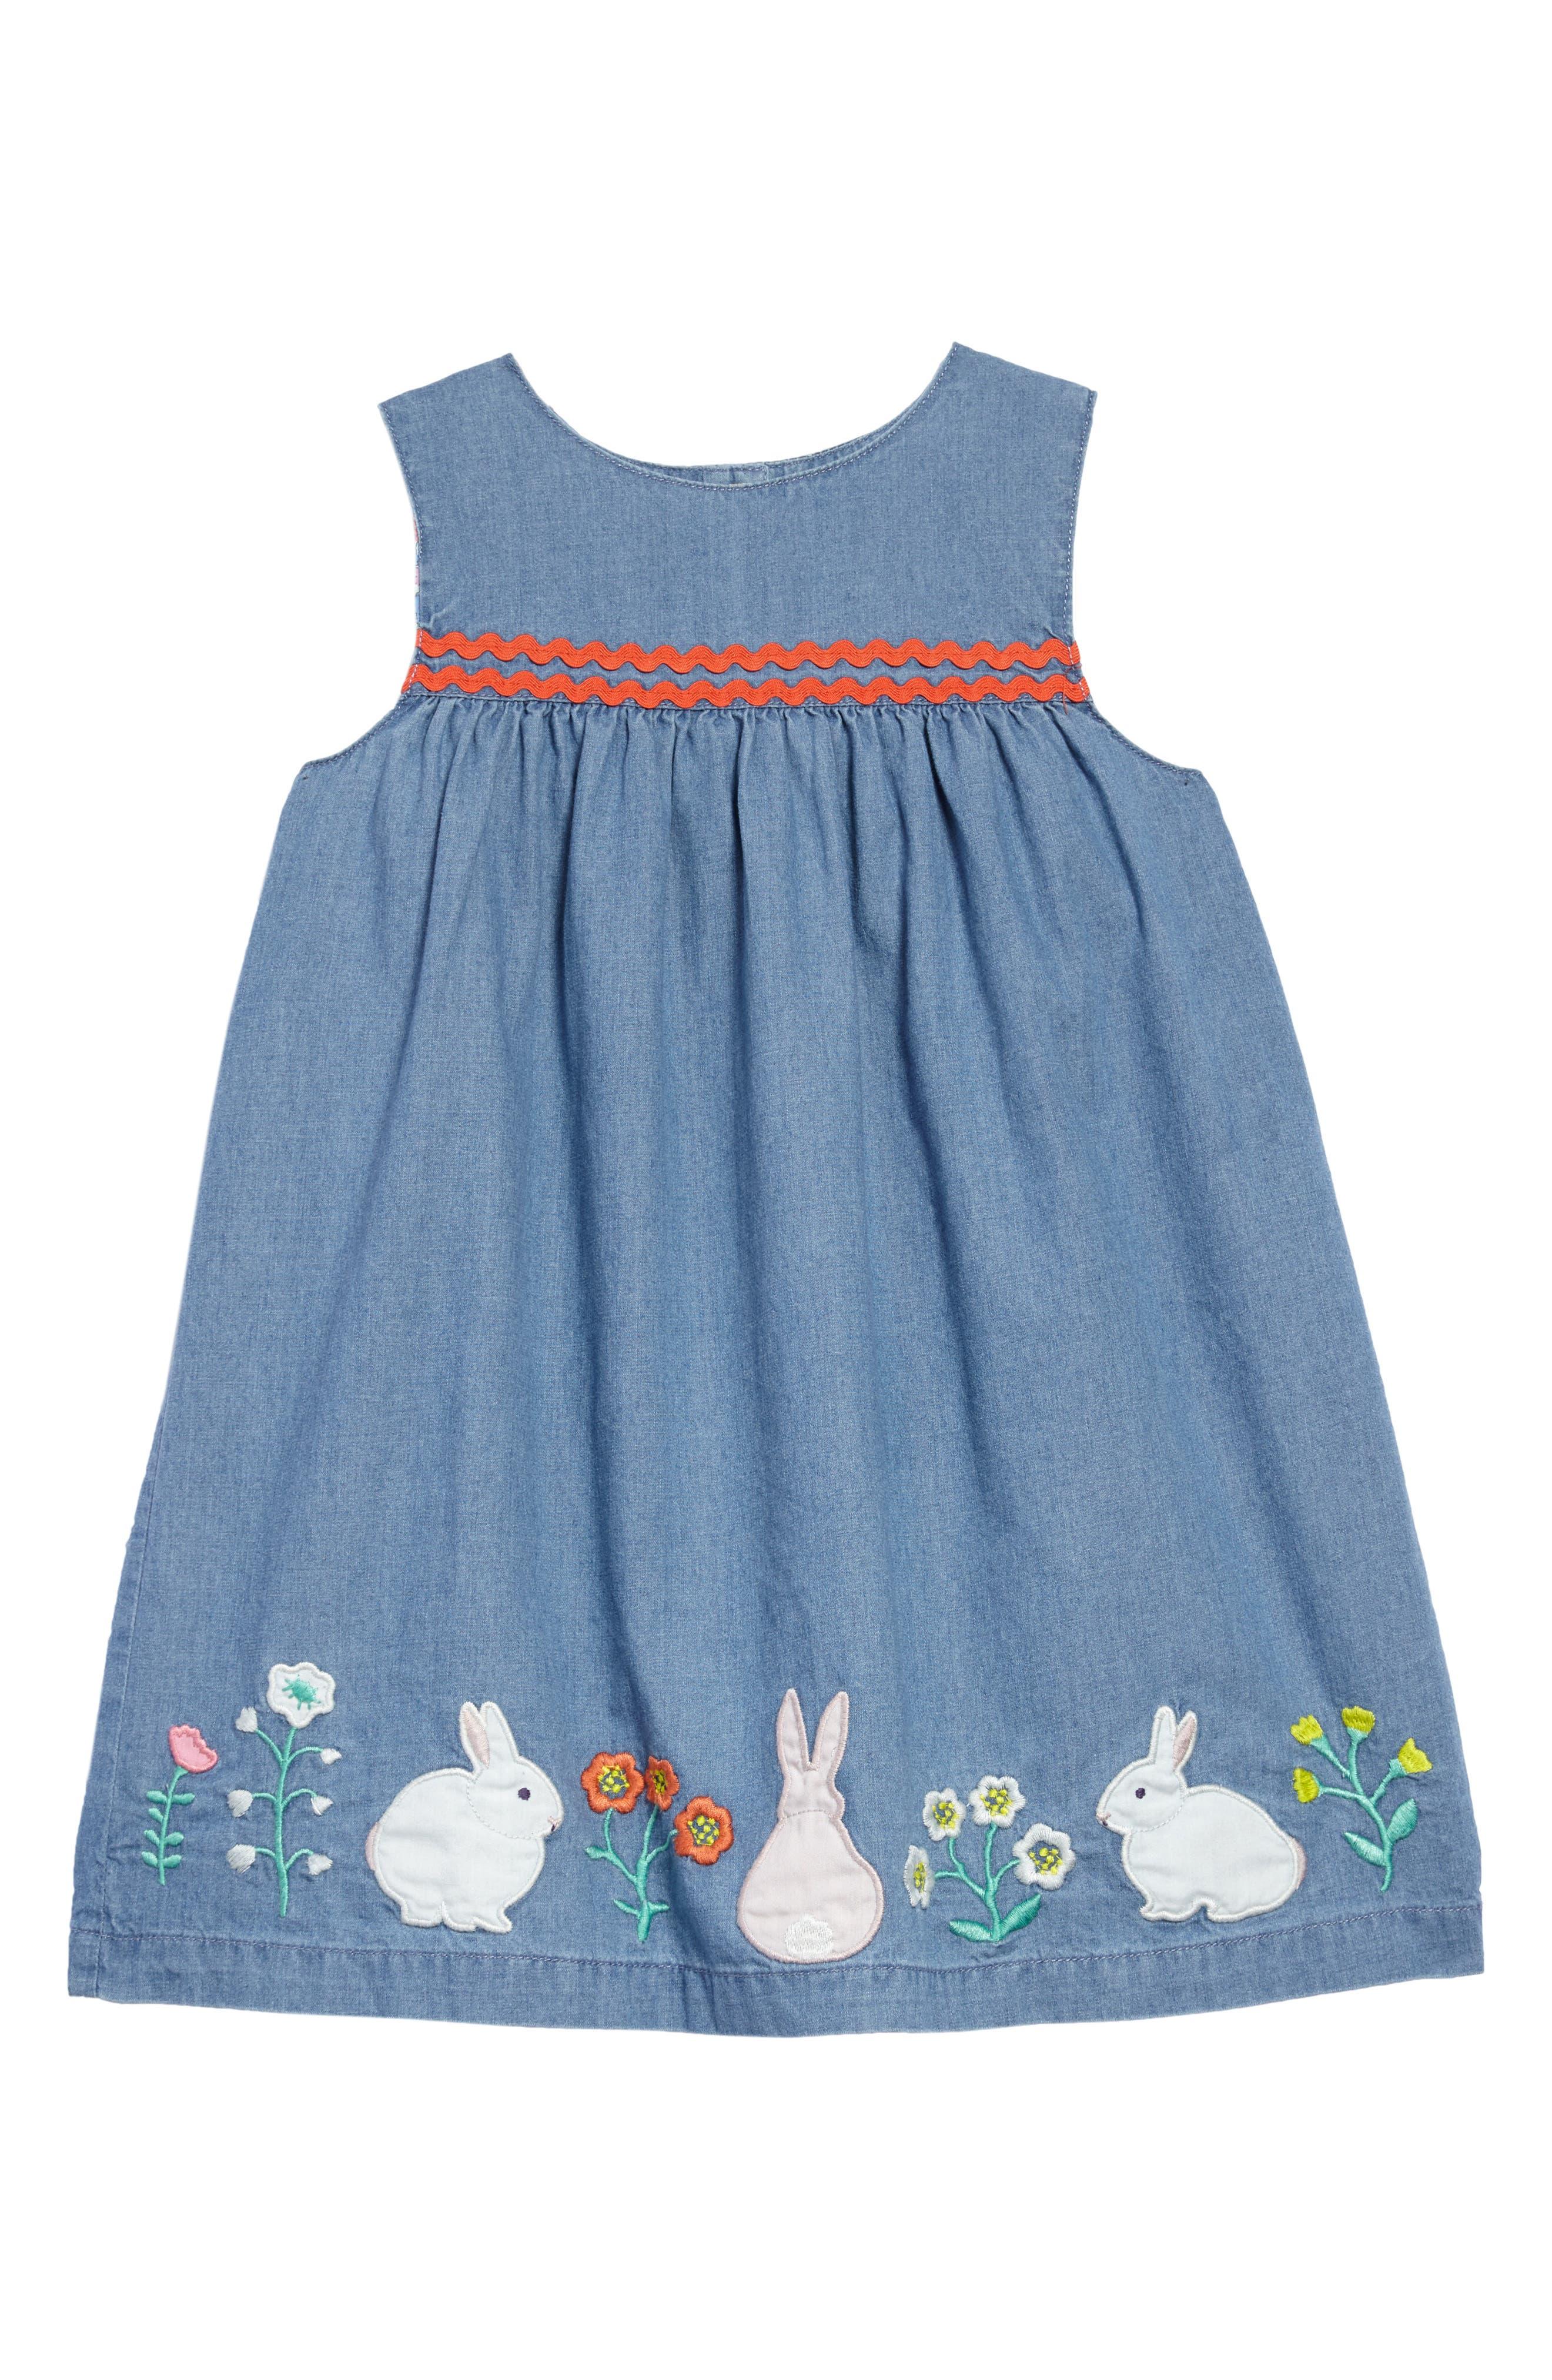 Woven Appliqué Dress,                             Main thumbnail 1, color,                             Chambray Flowers